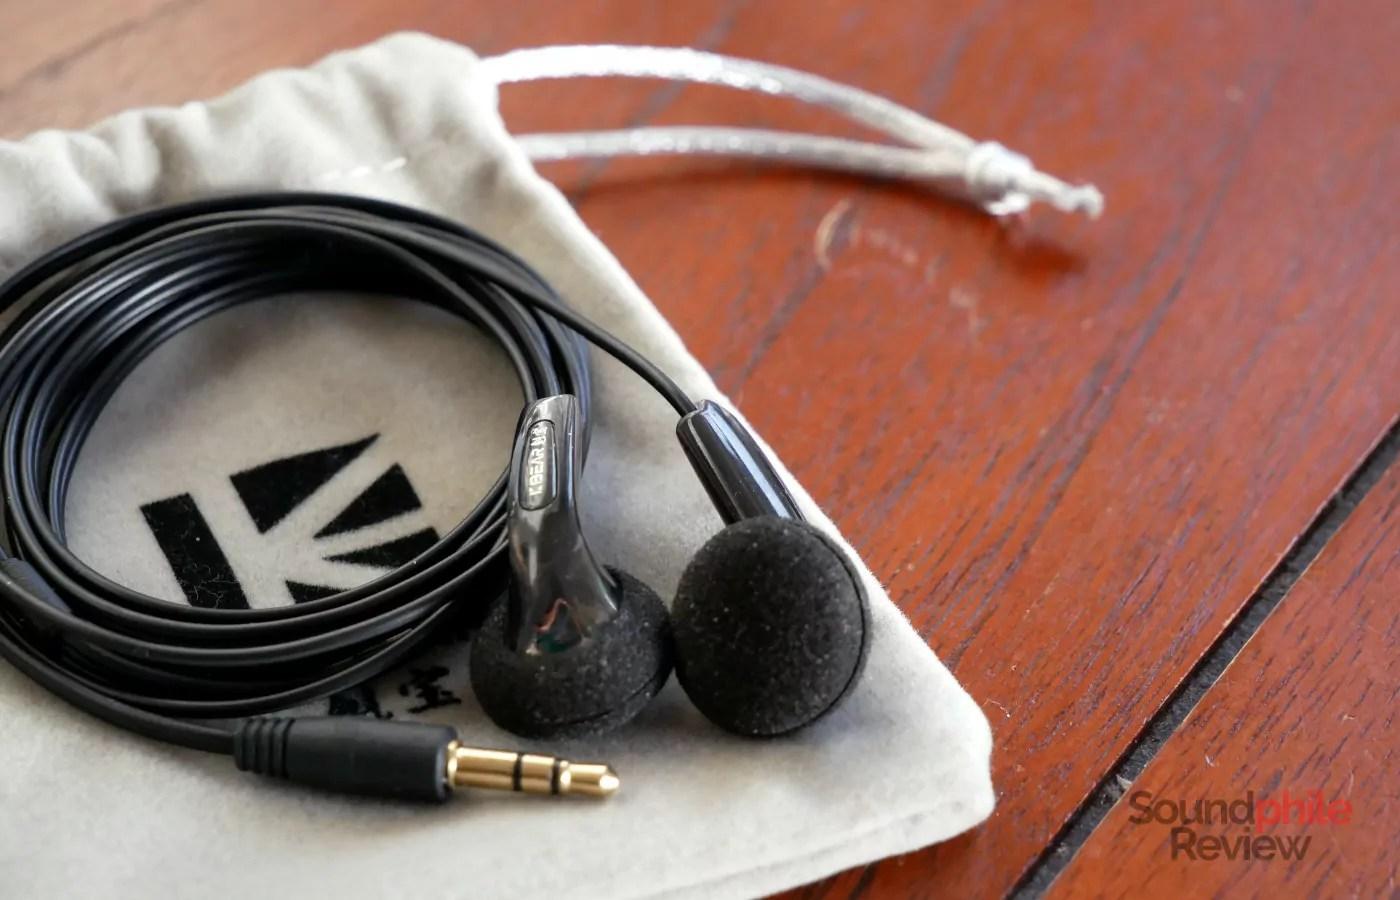 KB EAR Stellar review